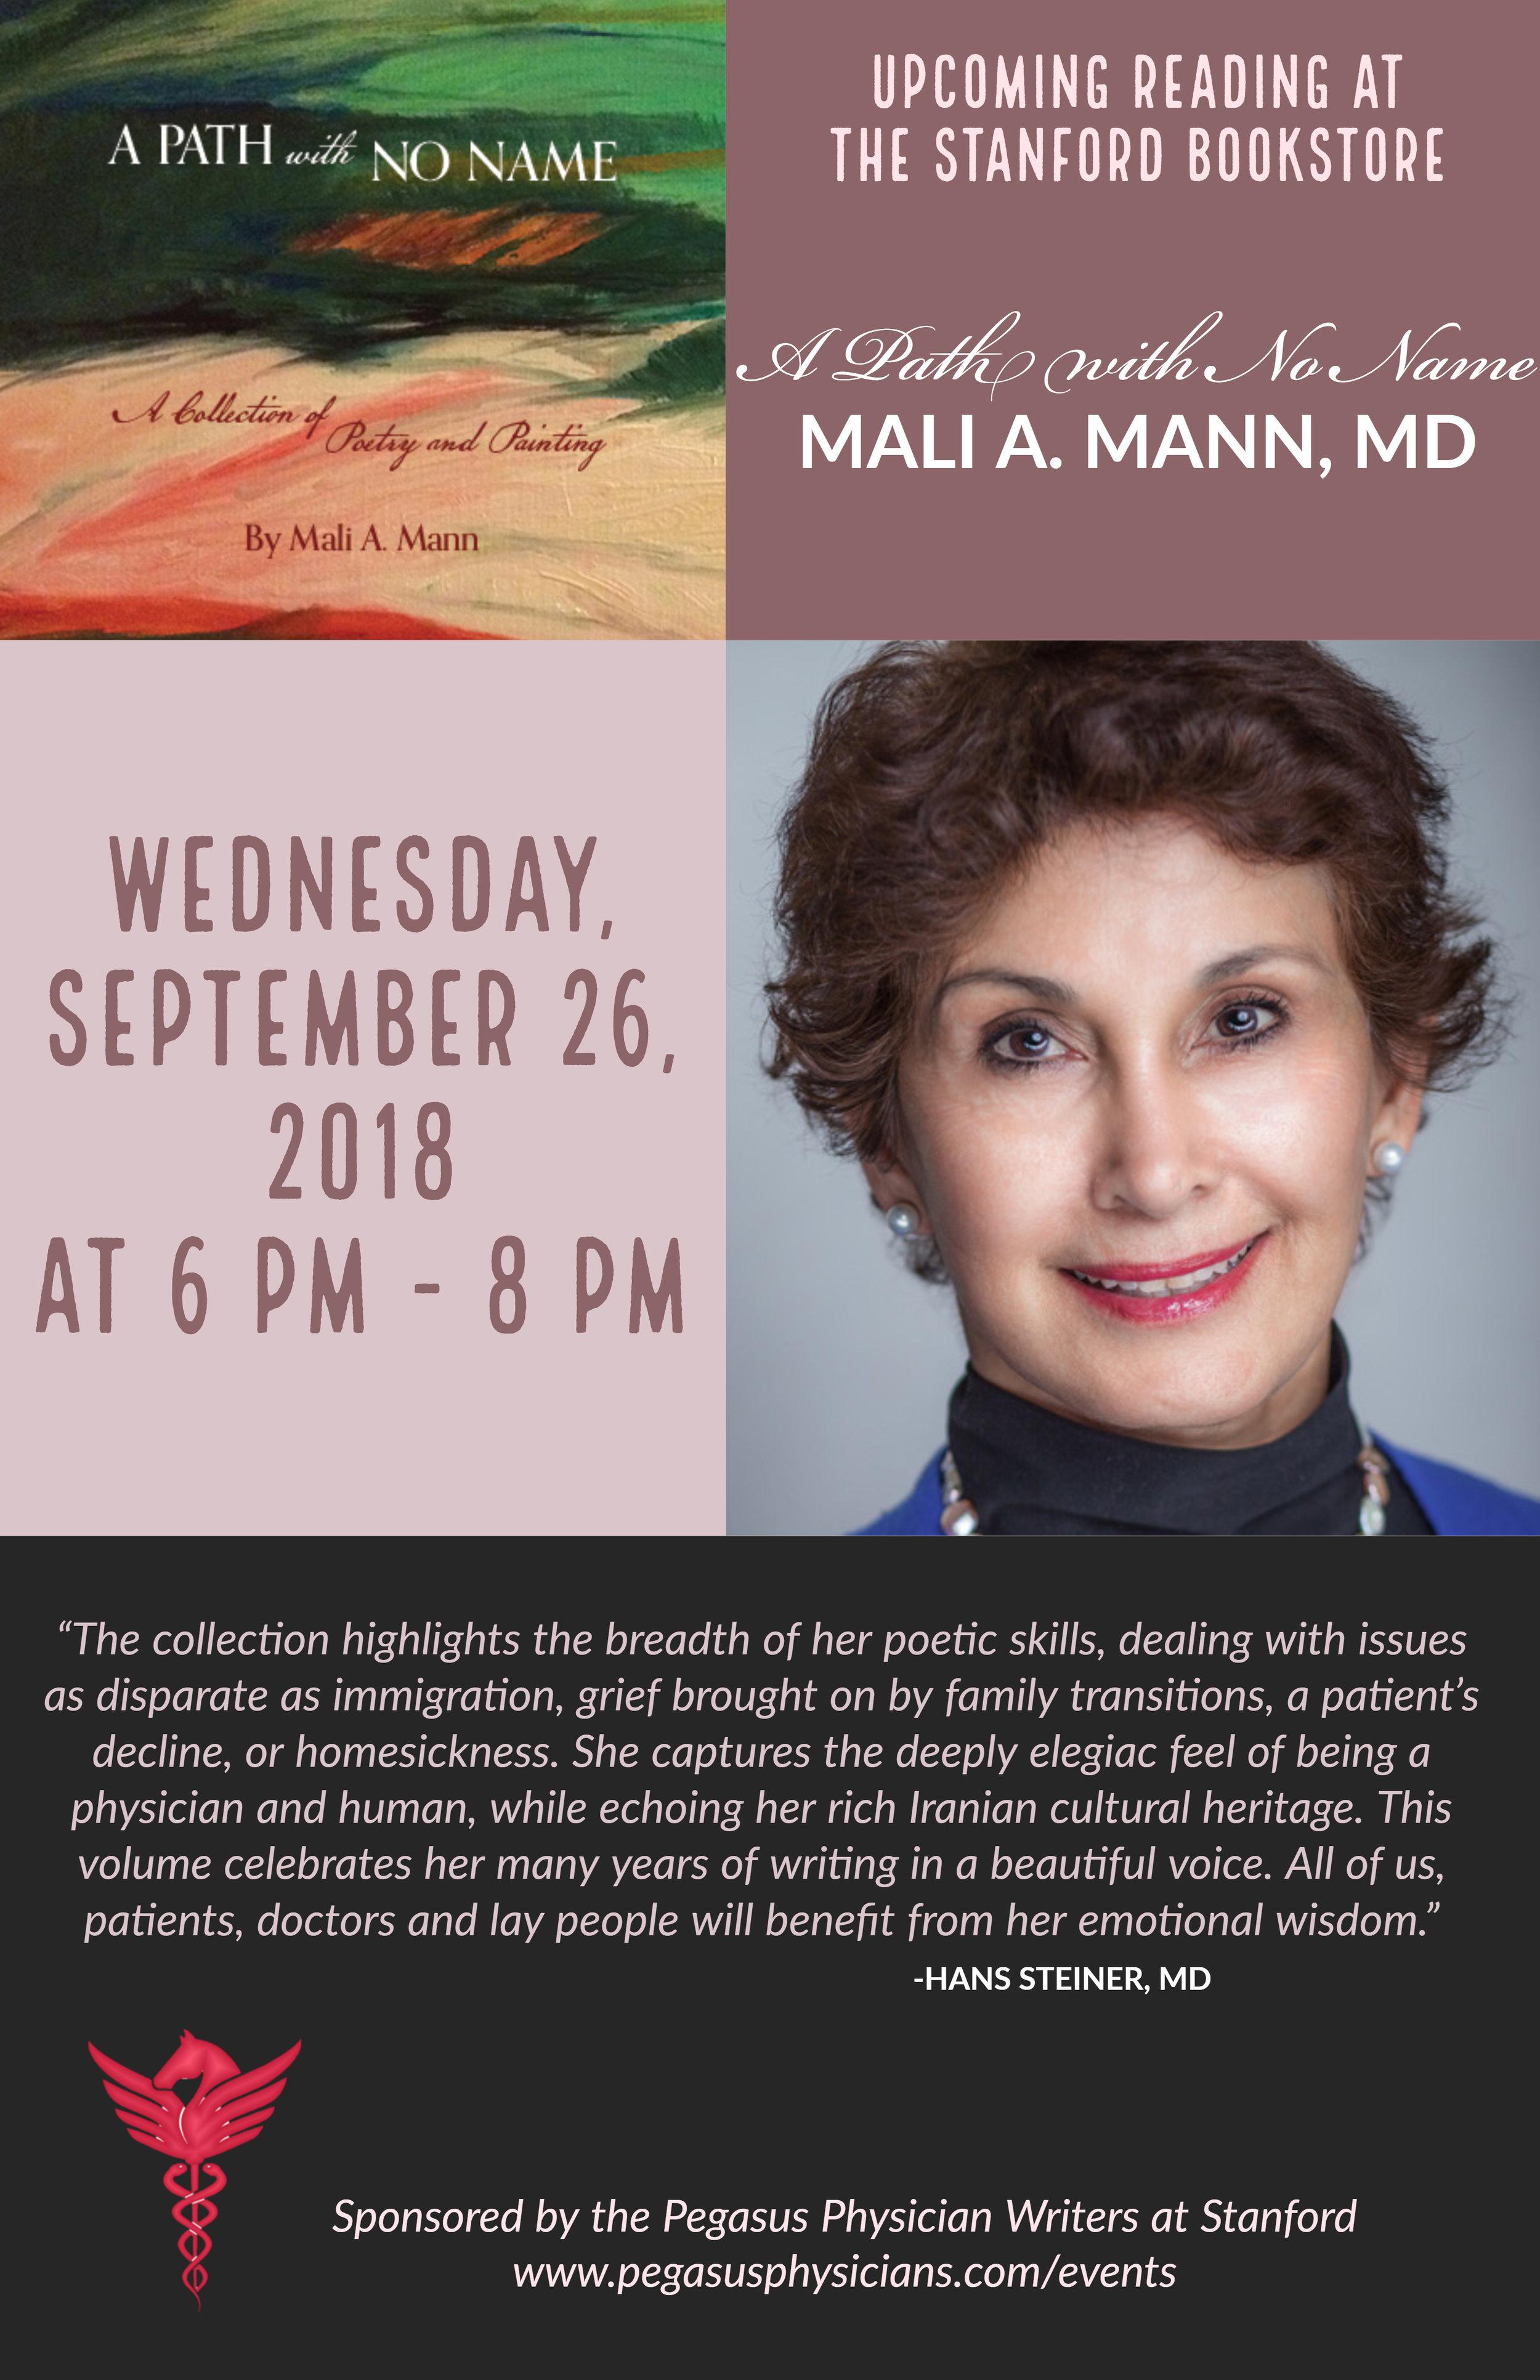 Sept 26, 2018 Bookstore Reading_Mail Mann.jpg